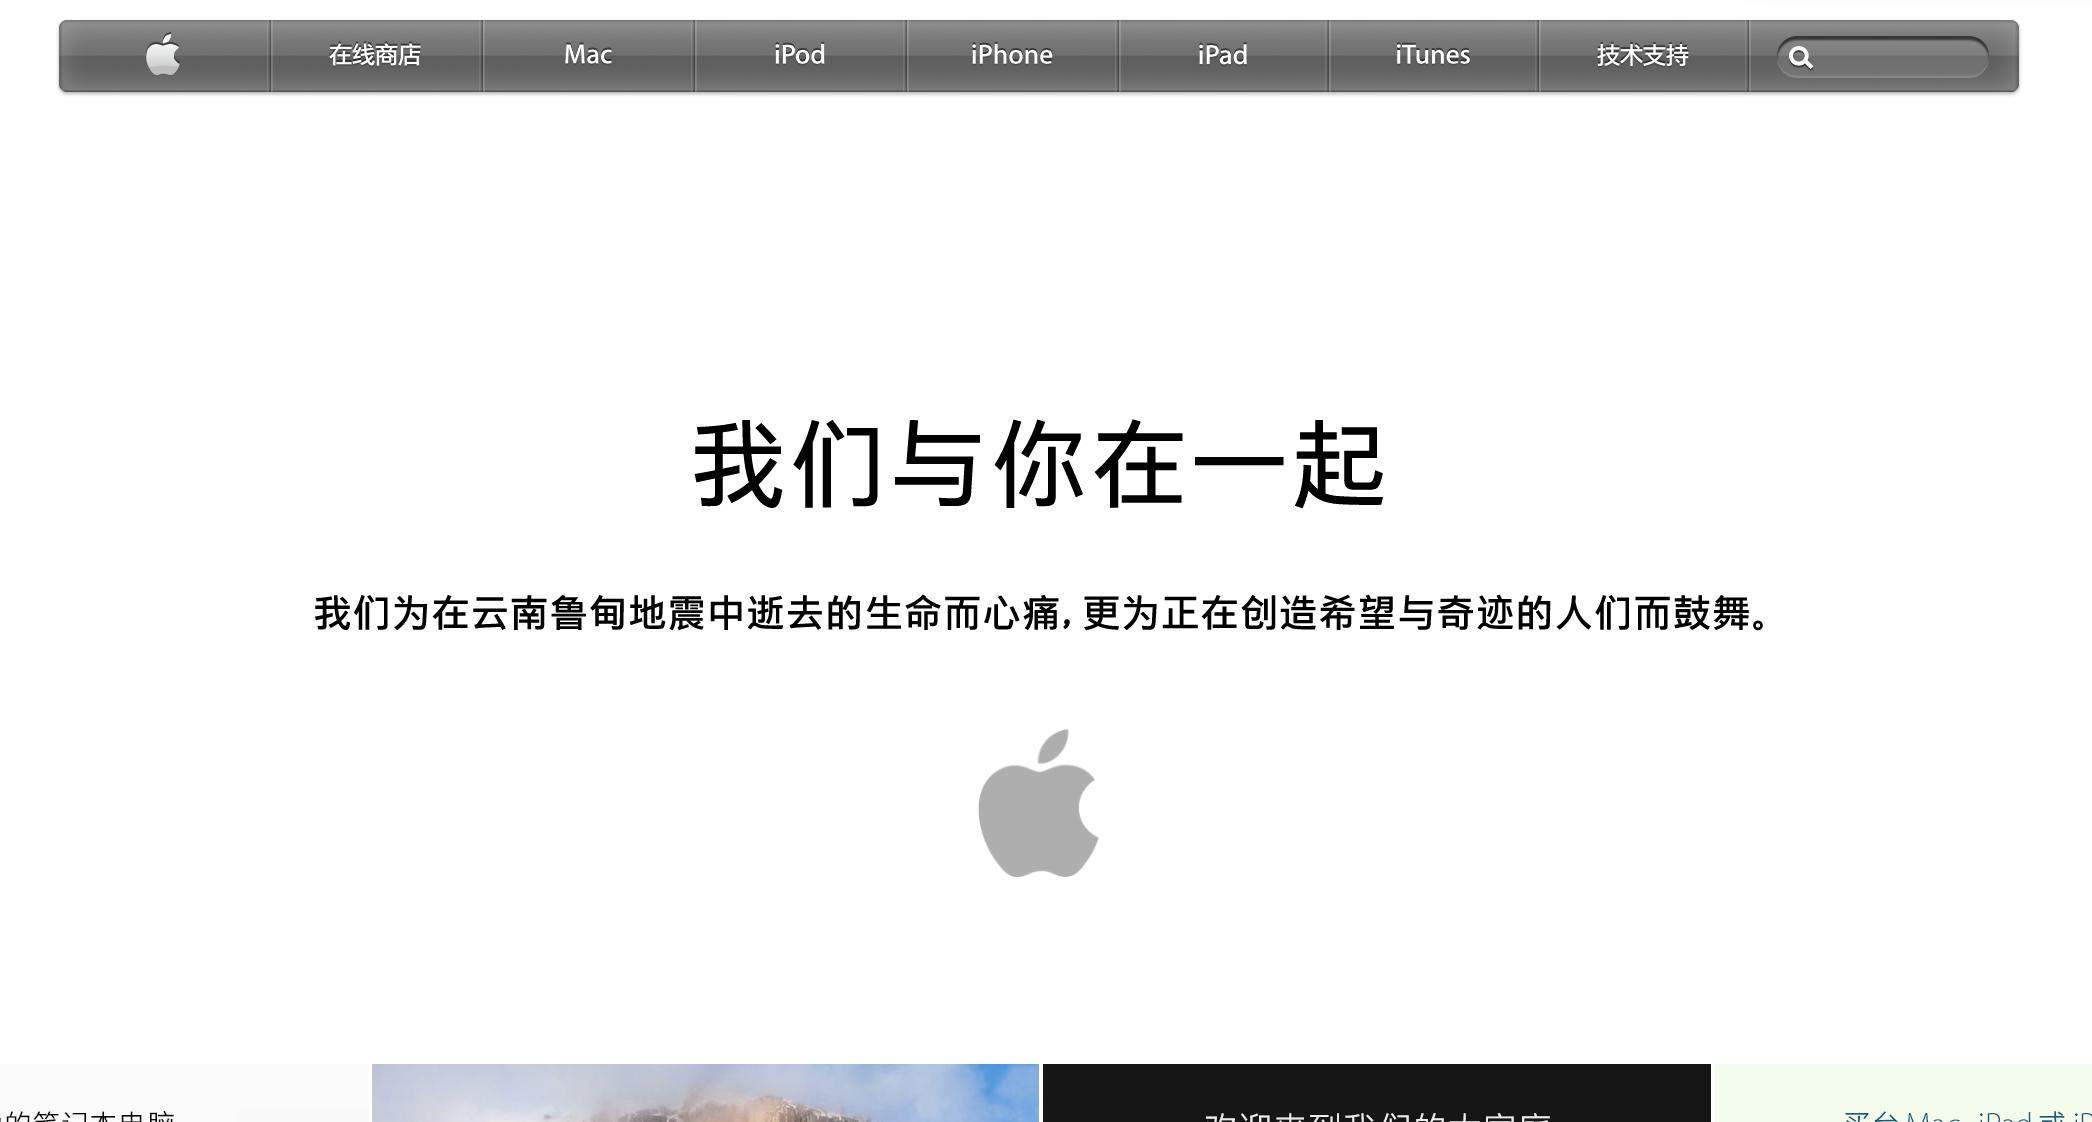 Screenshot 2014-08-08 08.26.34